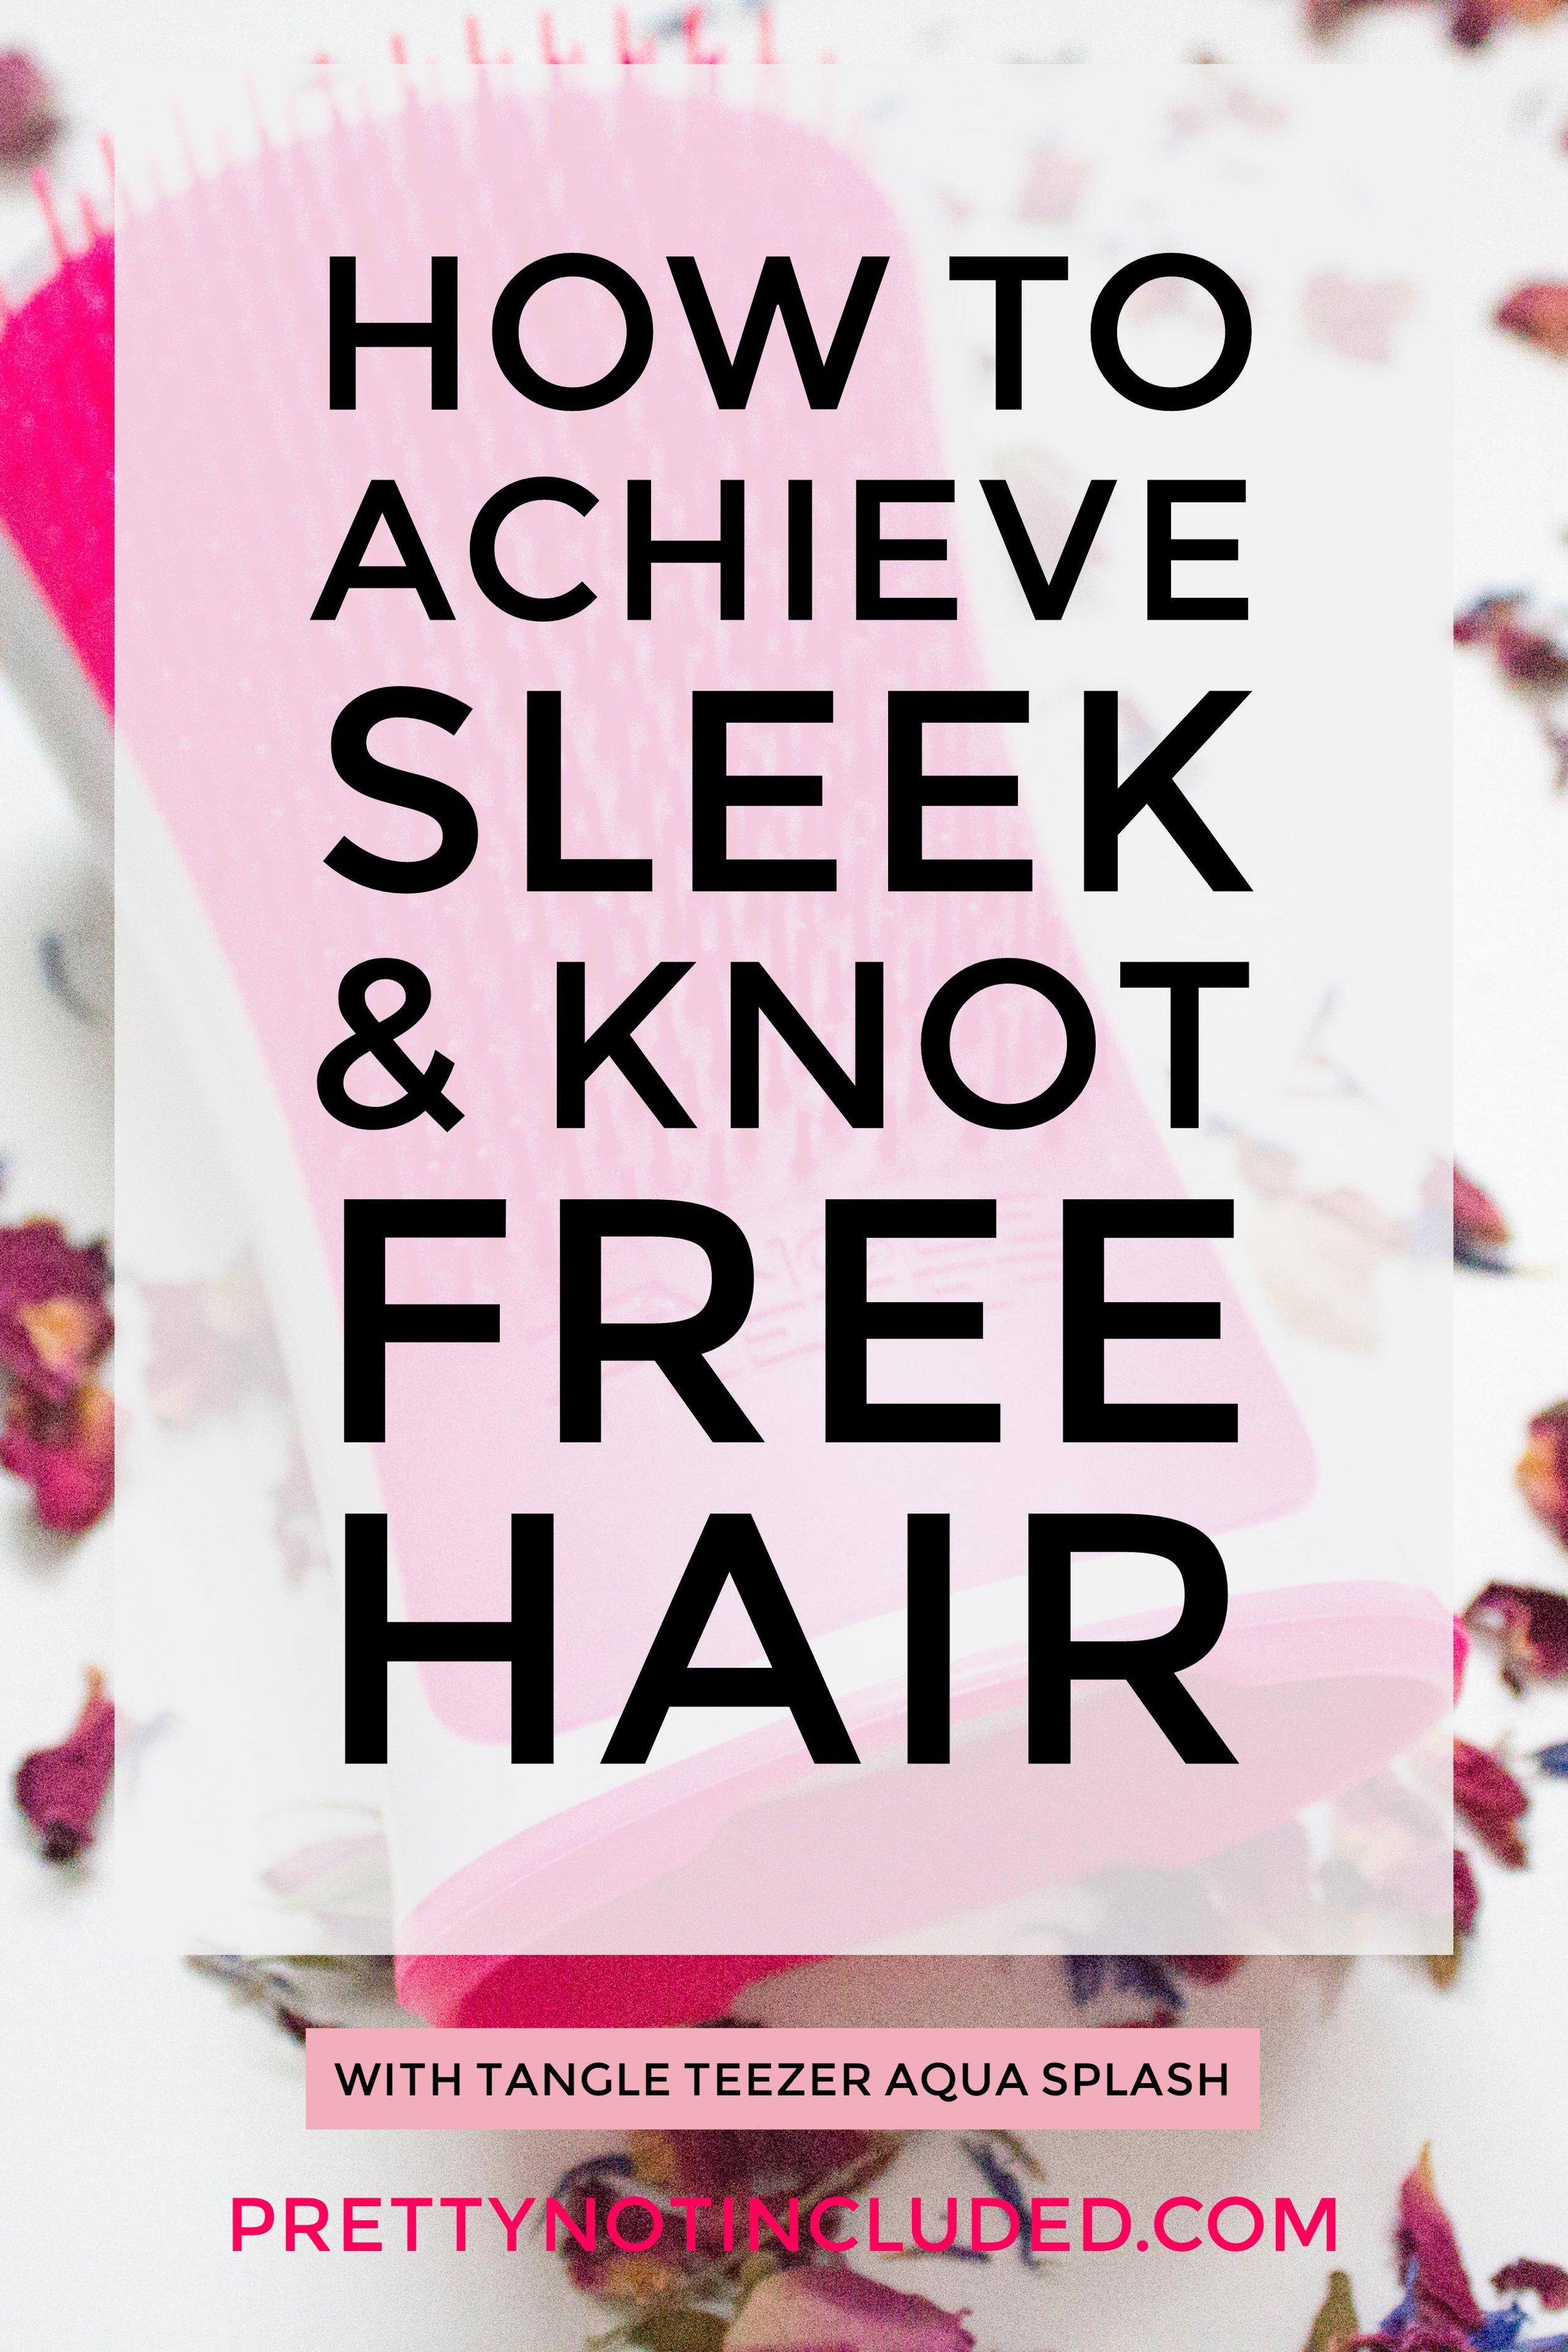 How to achieve Sleek & Knot Free Hair With Tangle Teezer Aqua Splash